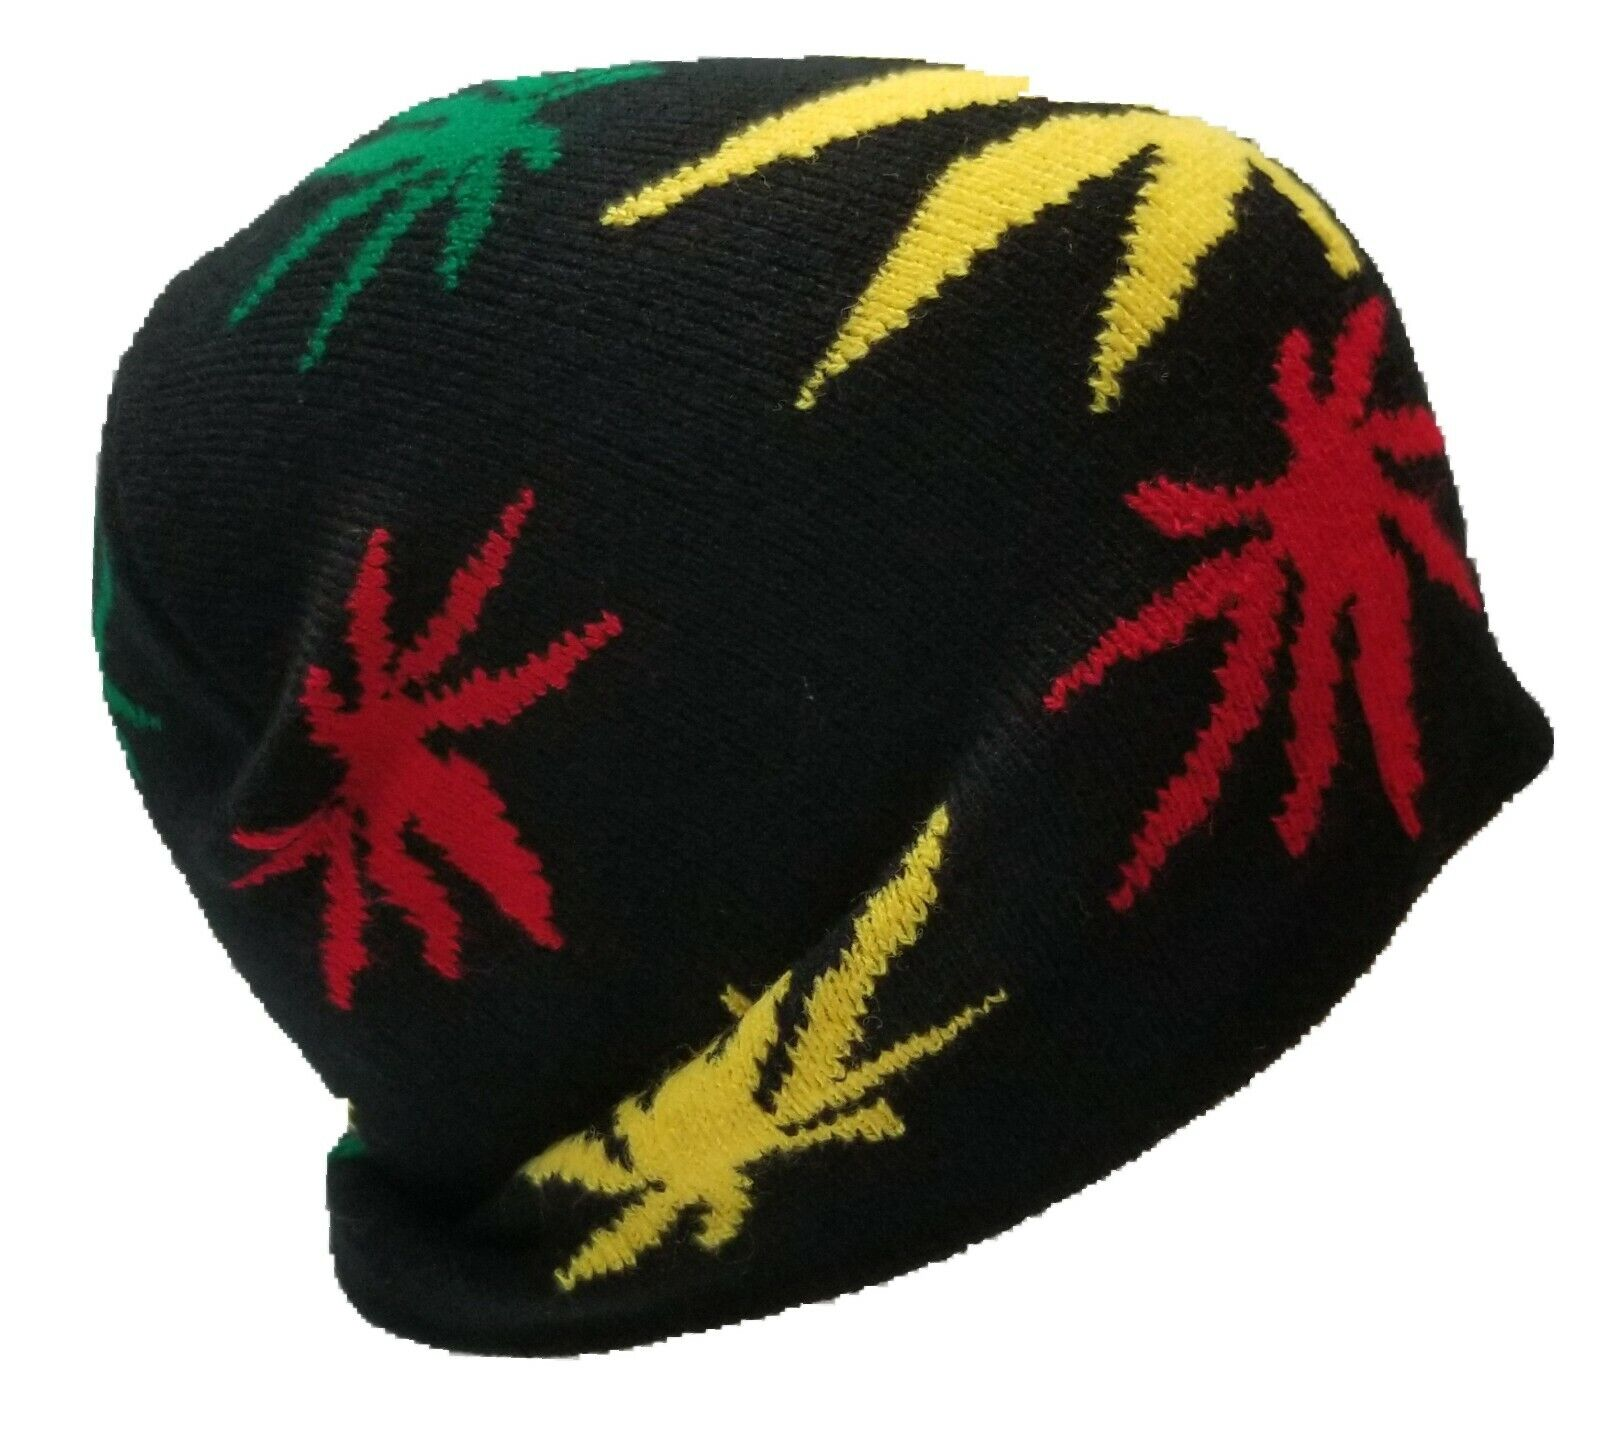 Rastafarian Pot Leaf Beanie Alternative Clothing Knit Rasta Marijuana Weed